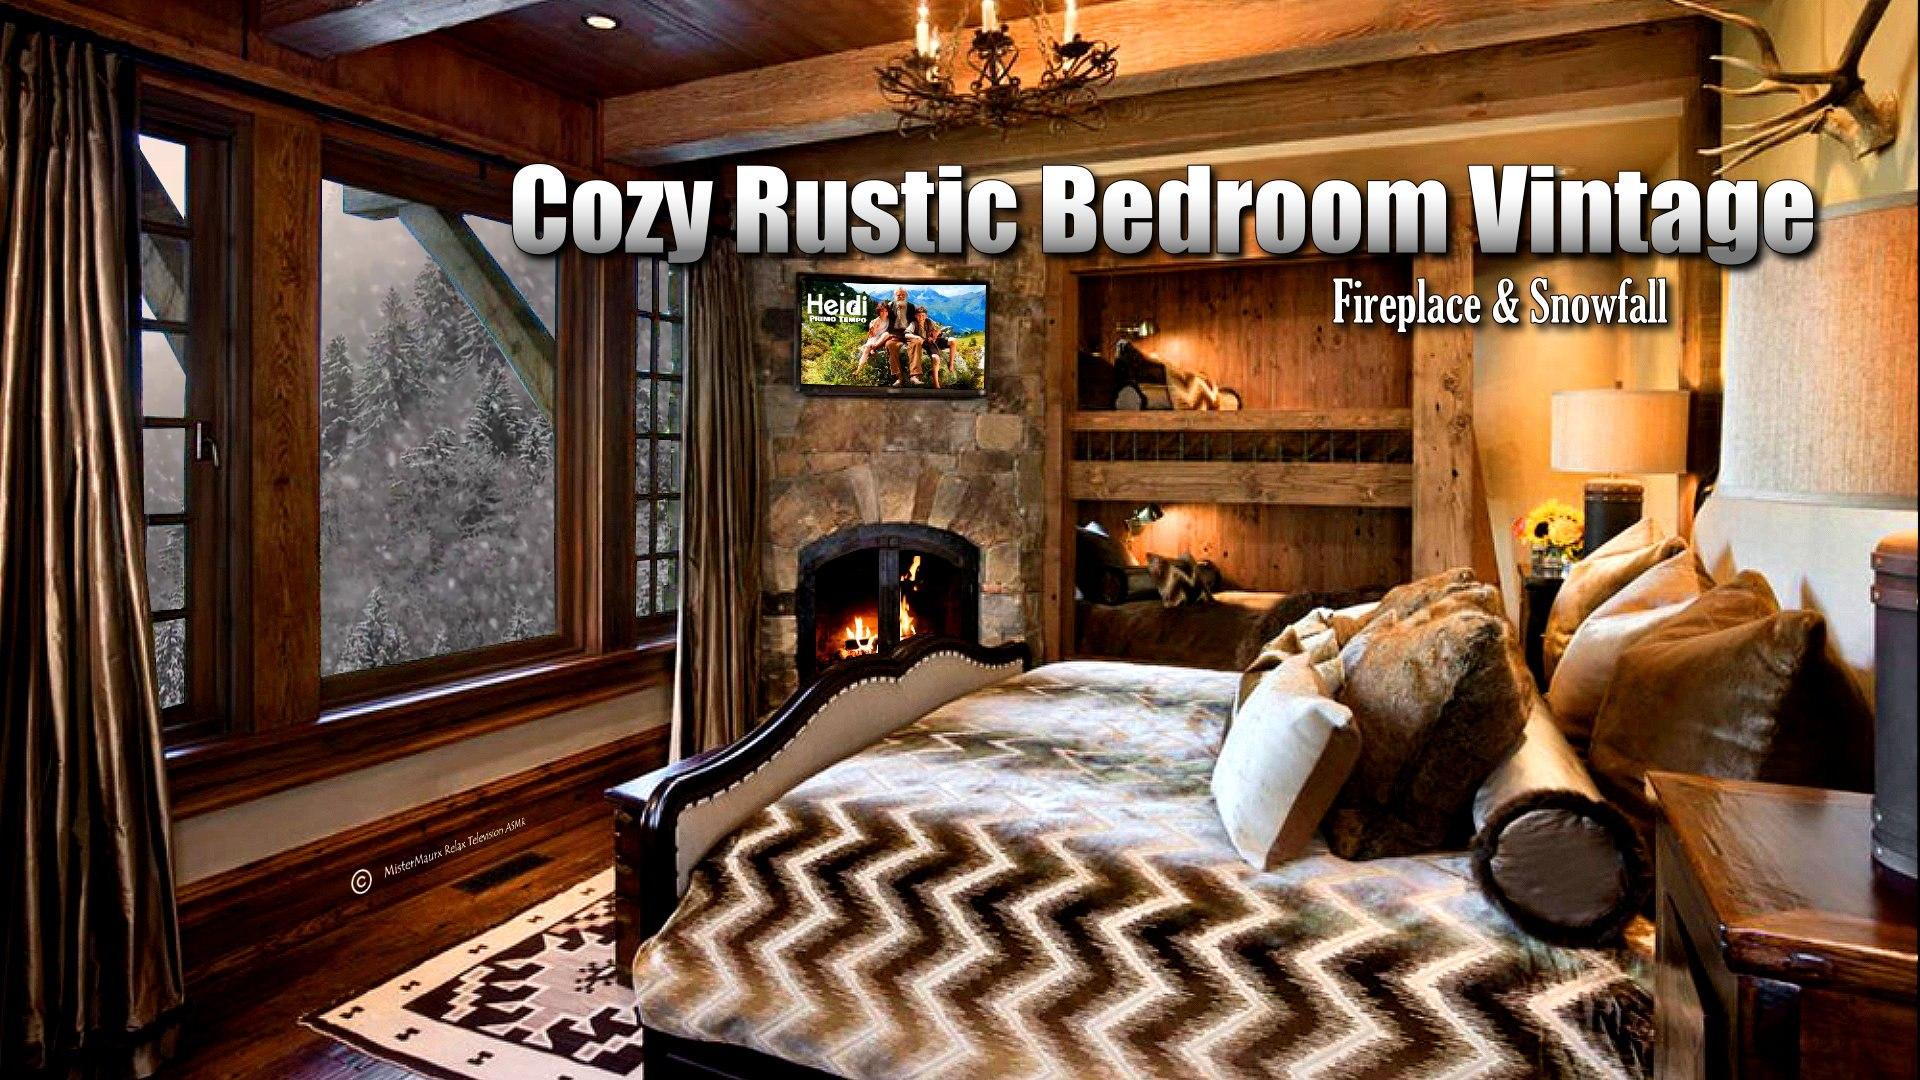 Fabulous Cozy Rustic Bedroom Vintage C Fireplace Snowfall Download Free Architecture Designs Rallybritishbridgeorg